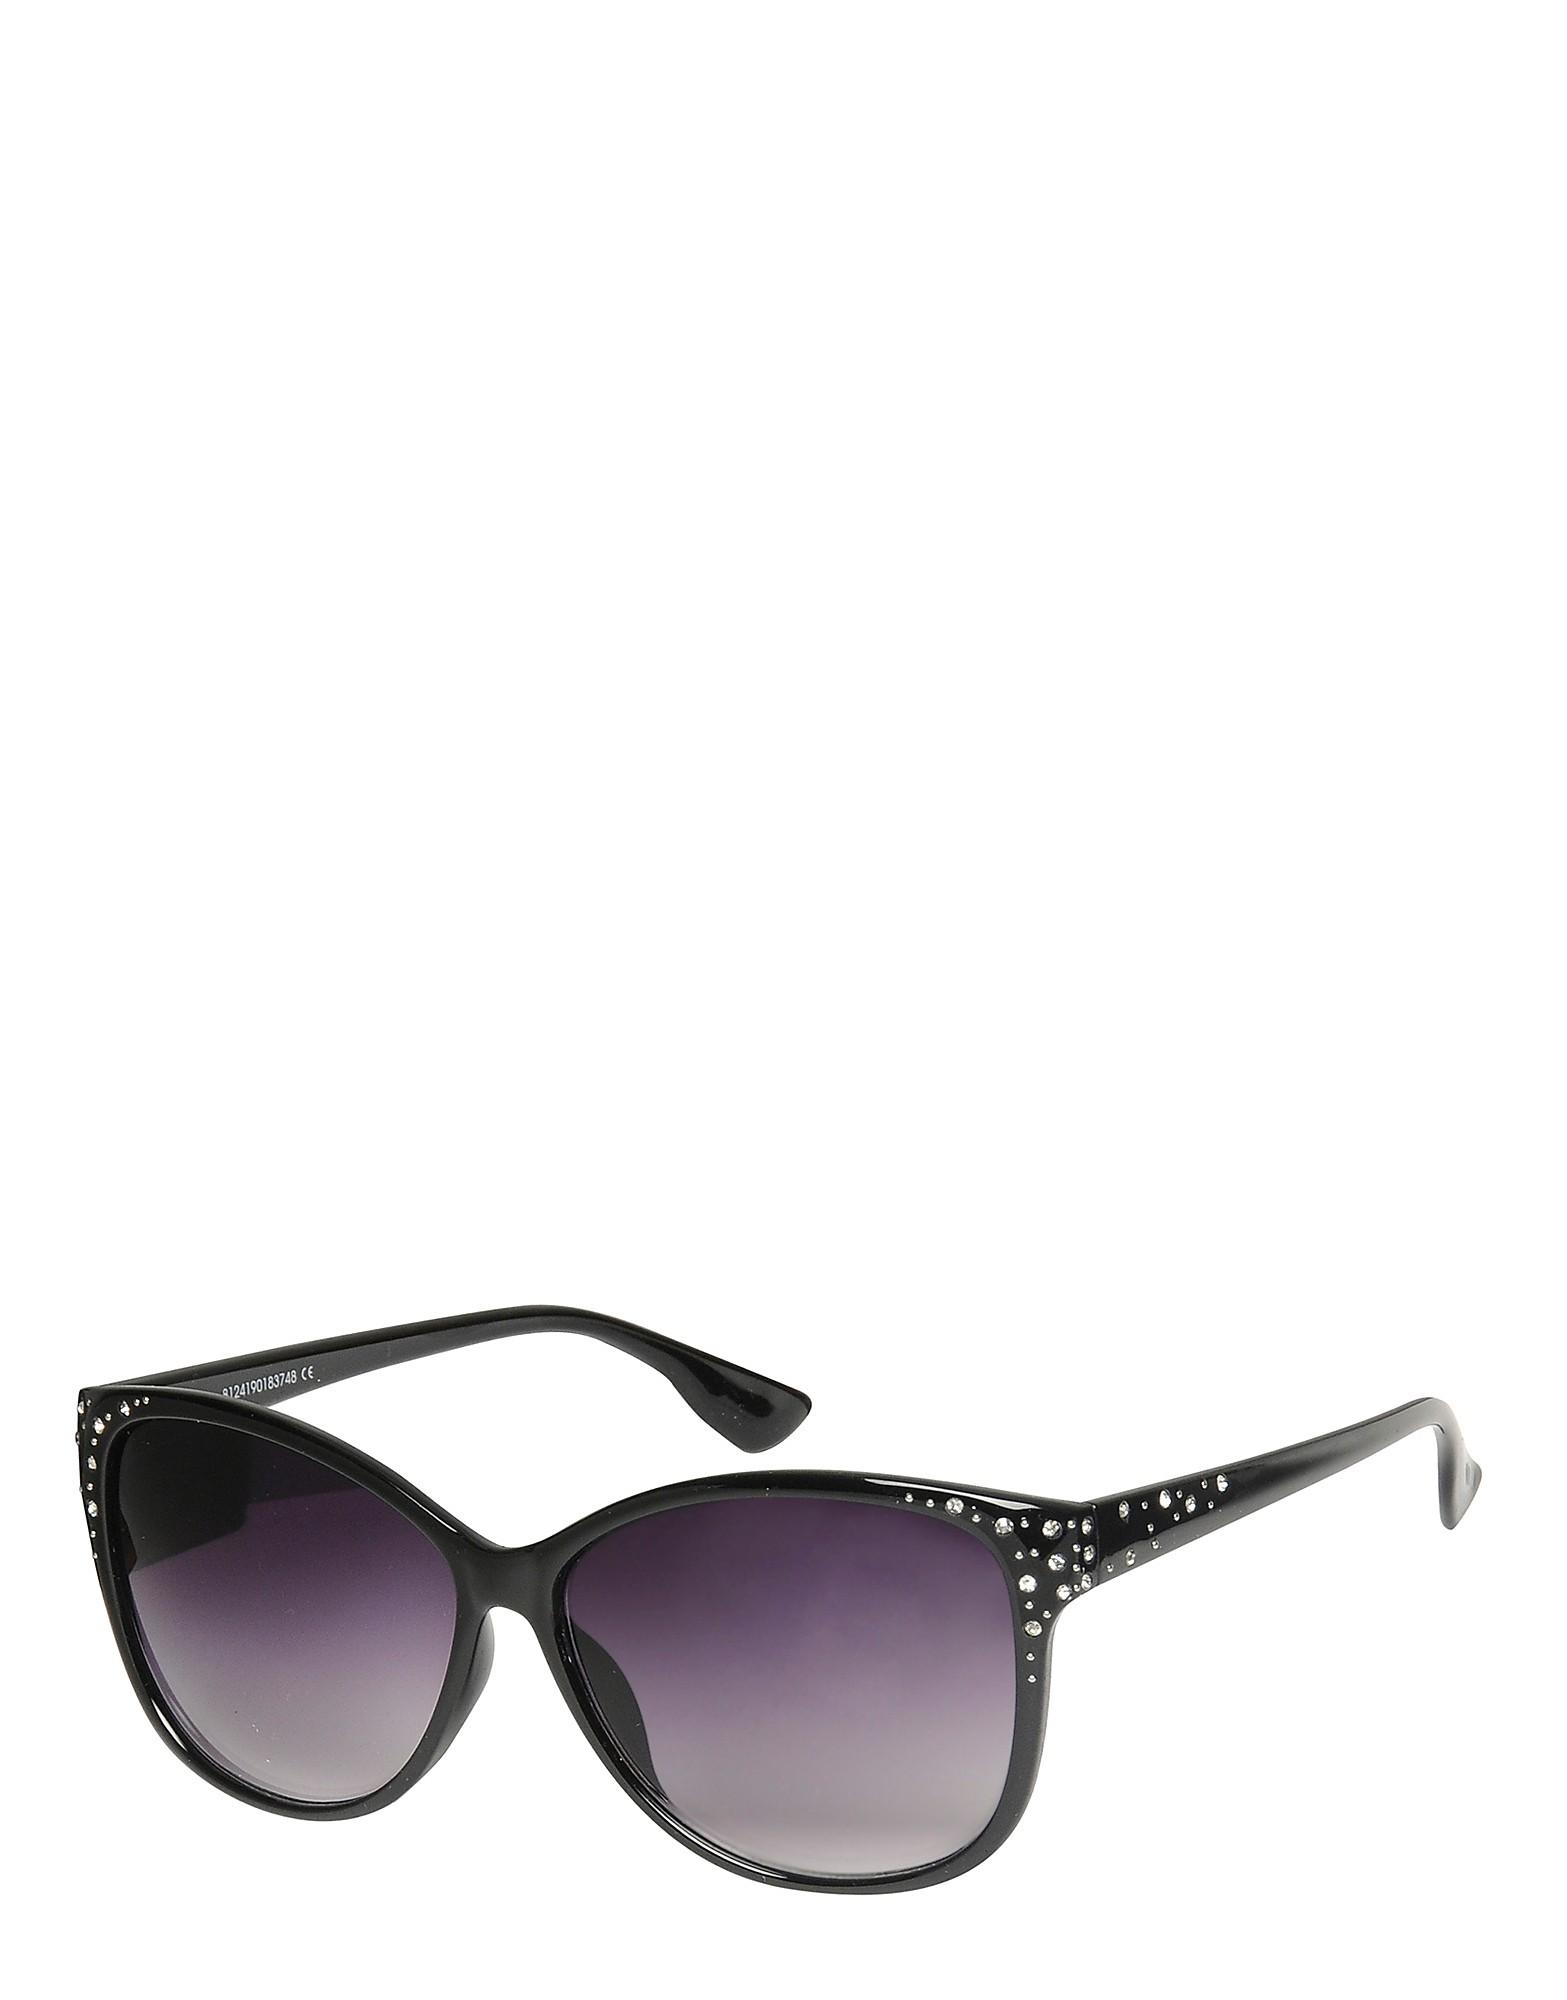 Brookhaven Millie Wayfarer Diamante Sunglasses - Only at JD - Black - Womens, Black